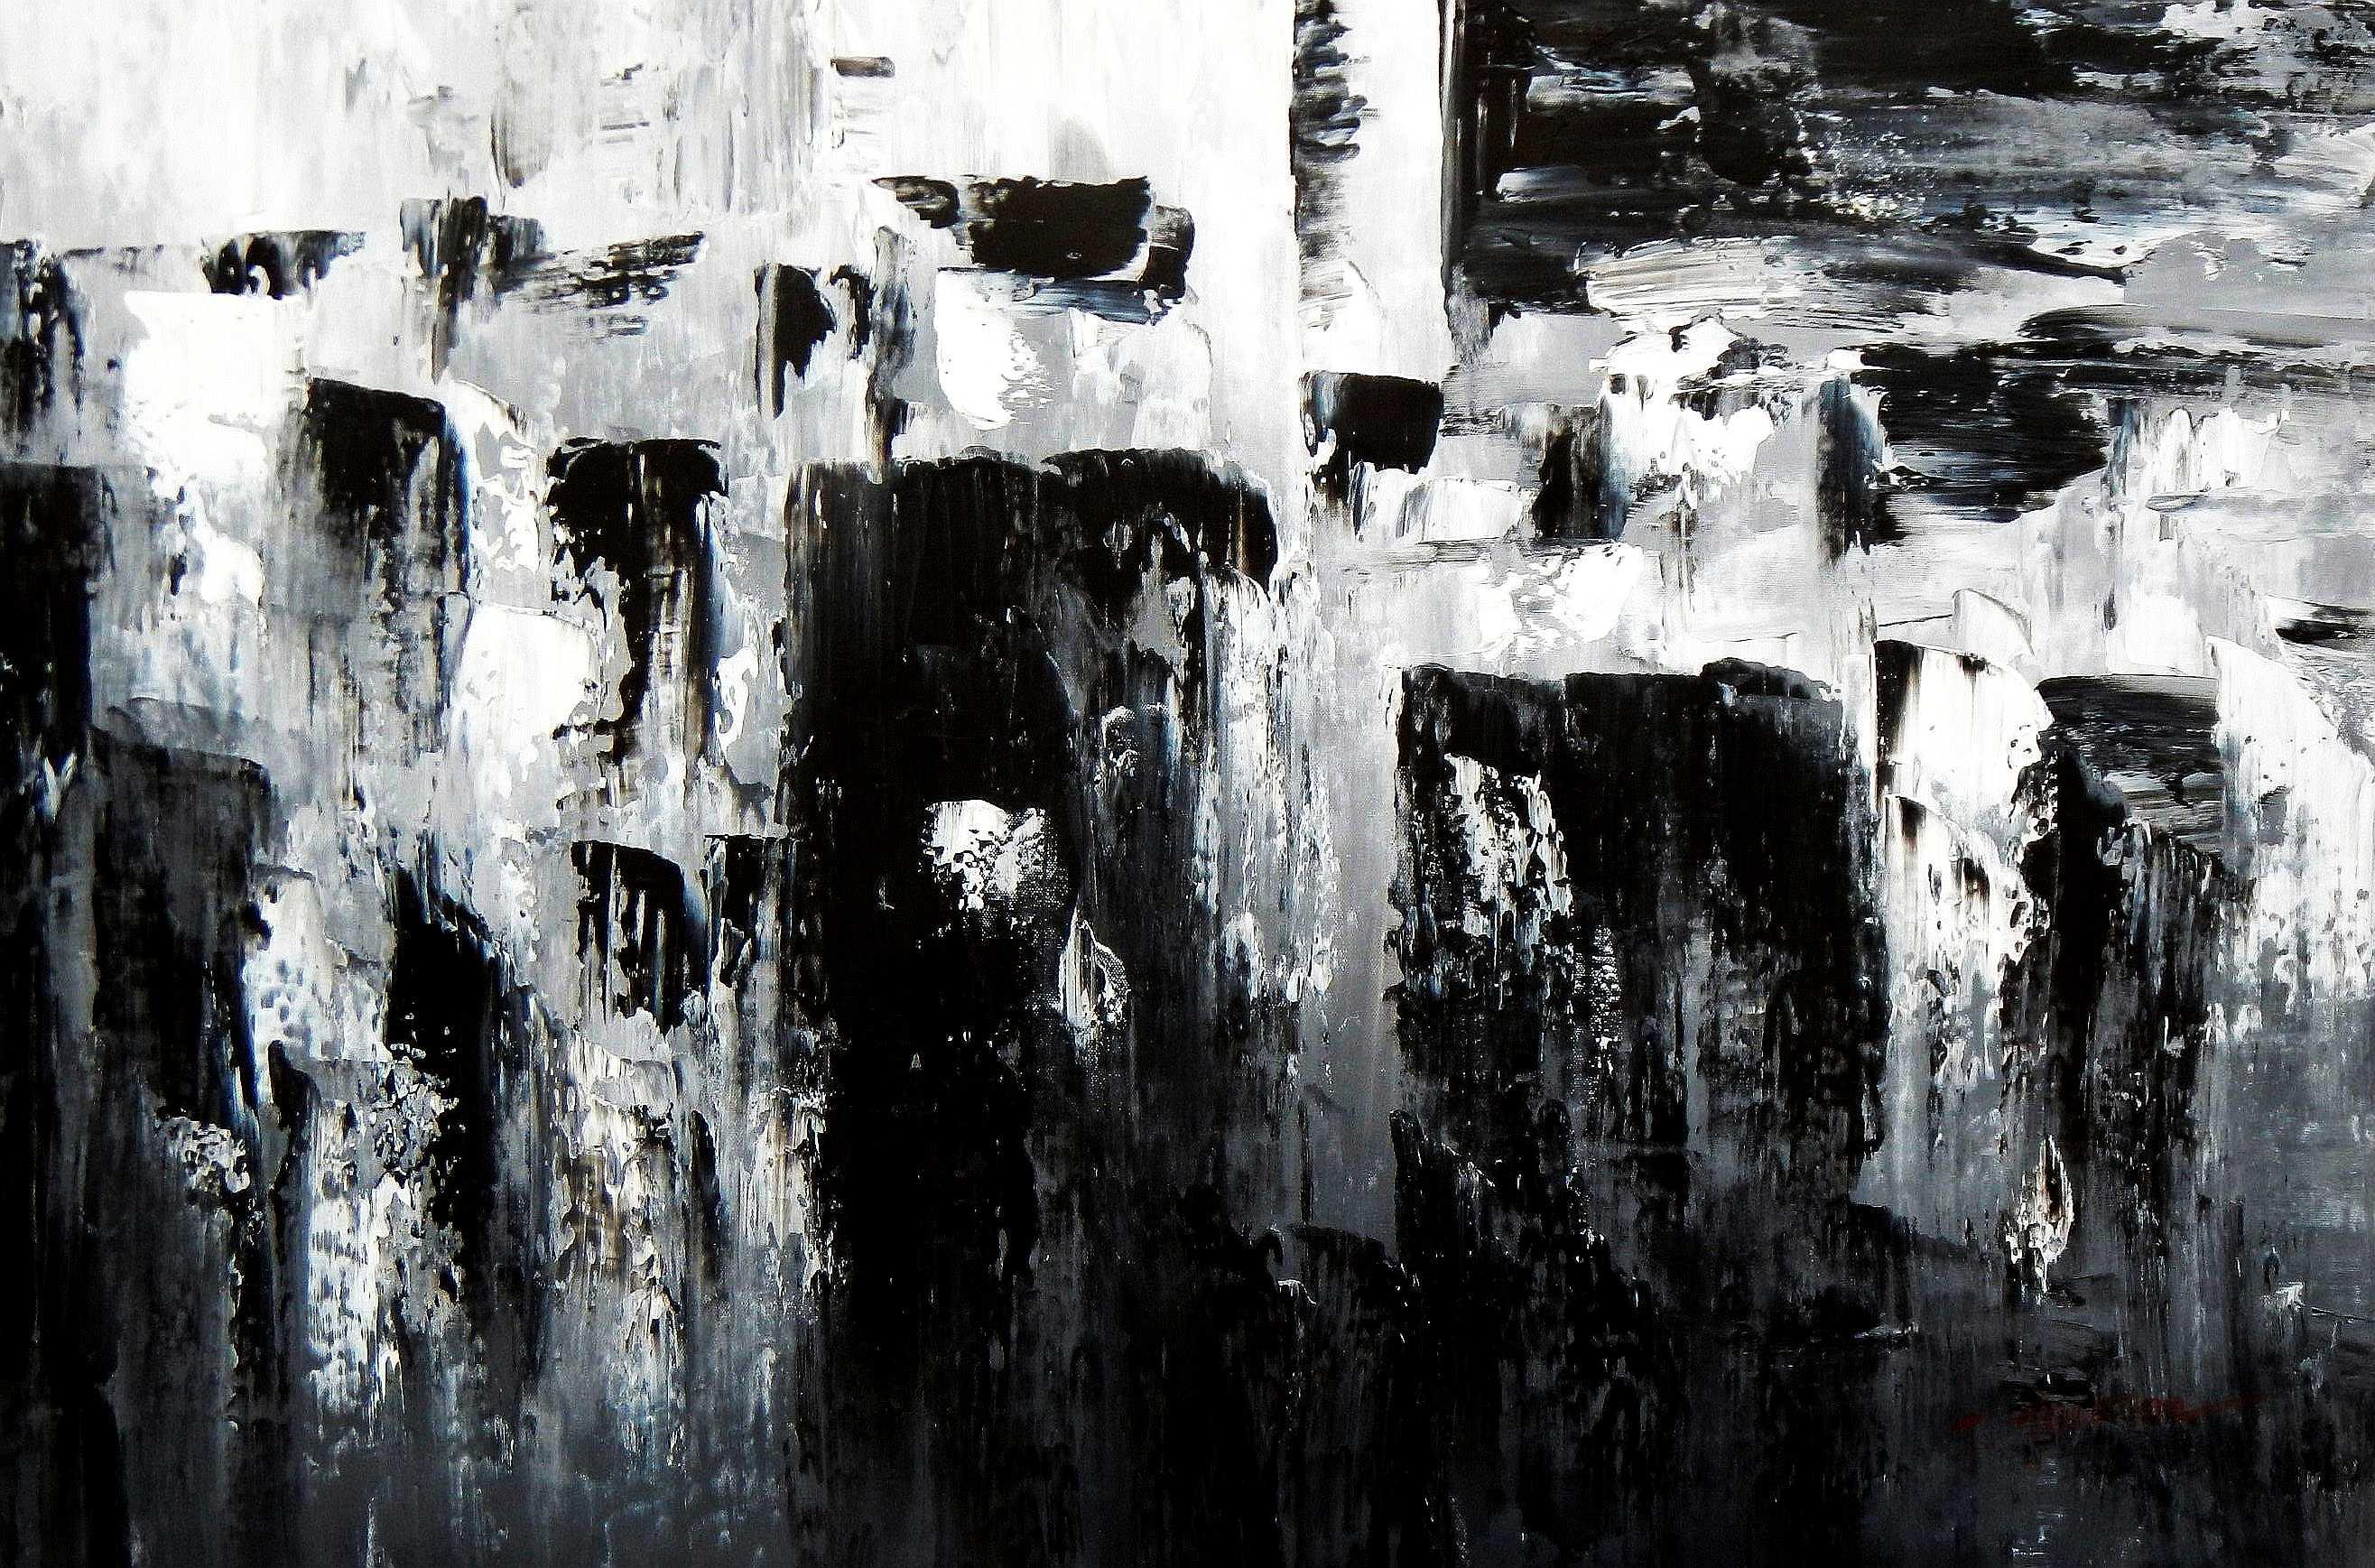 Abstrakt - Nacht in New York d94875 60x90cm Ölgemälde handgemalt